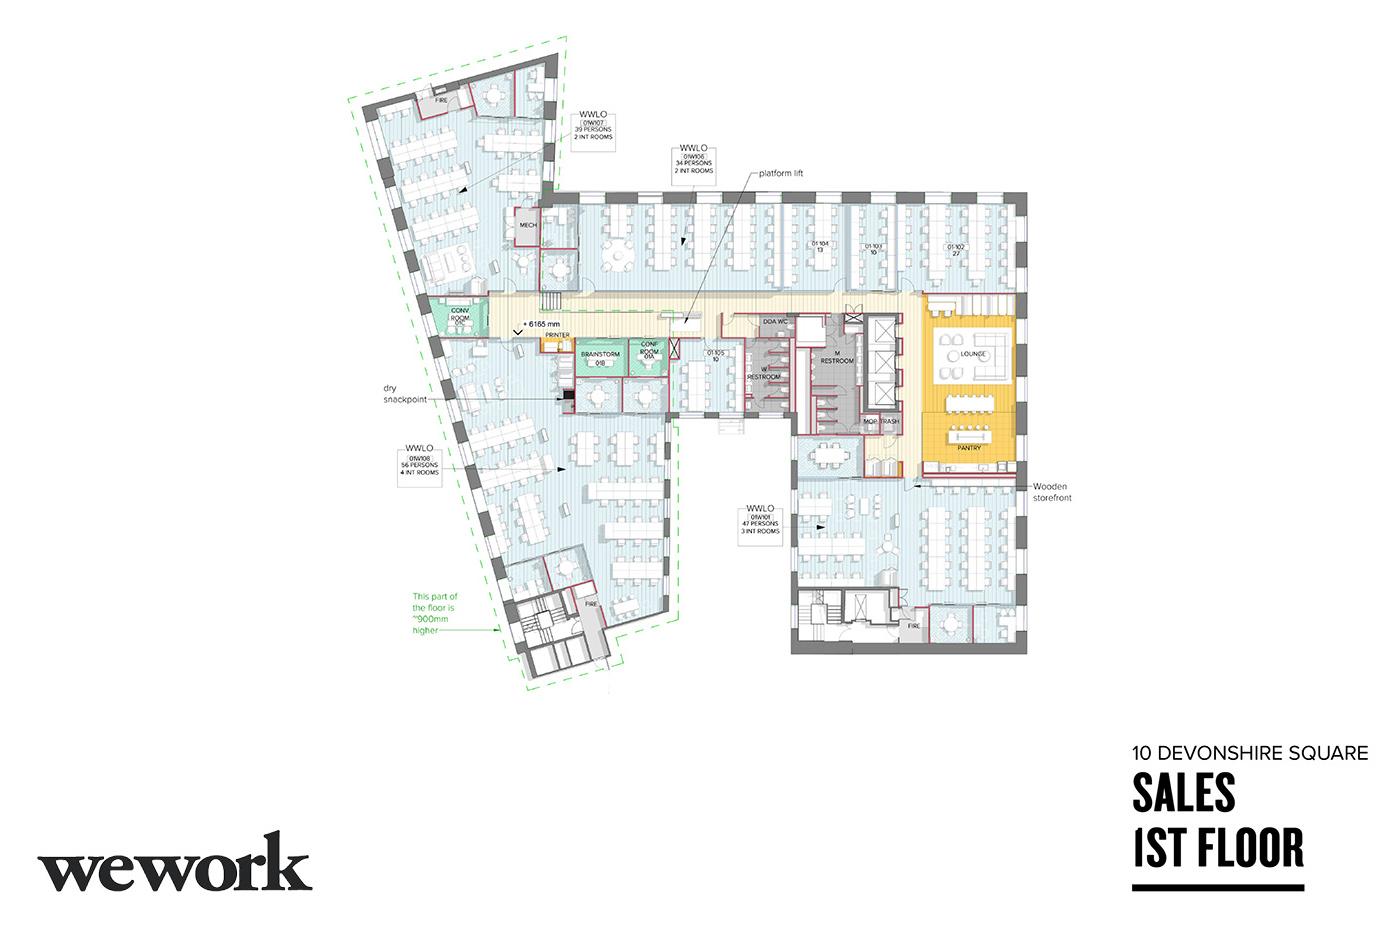 floorplans-13 copy.jpg